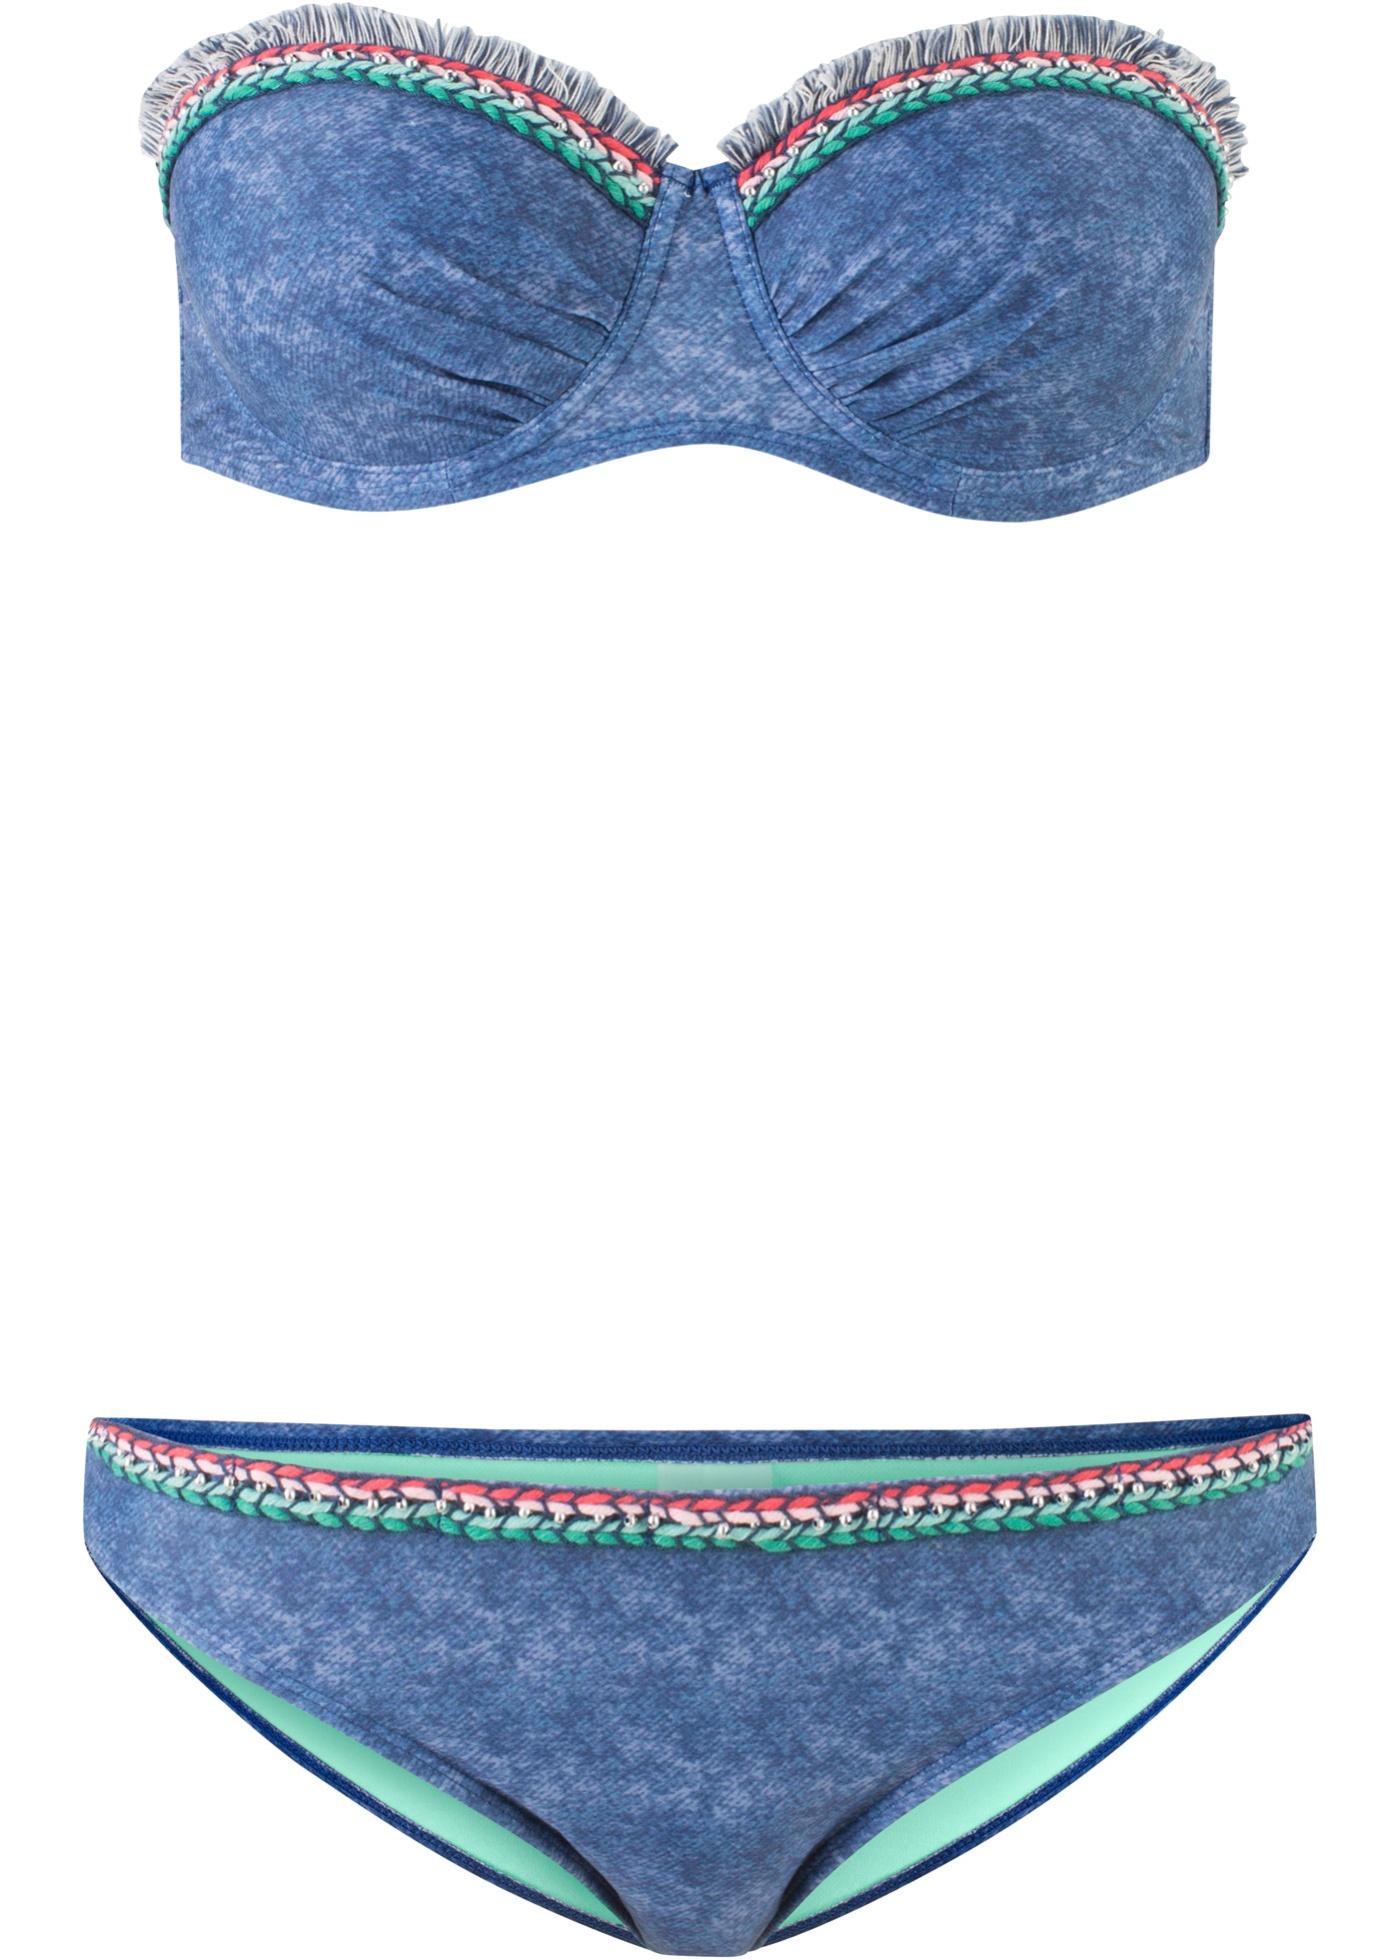 Bikini à armatures (Ens. 2 pces.), Bon. B